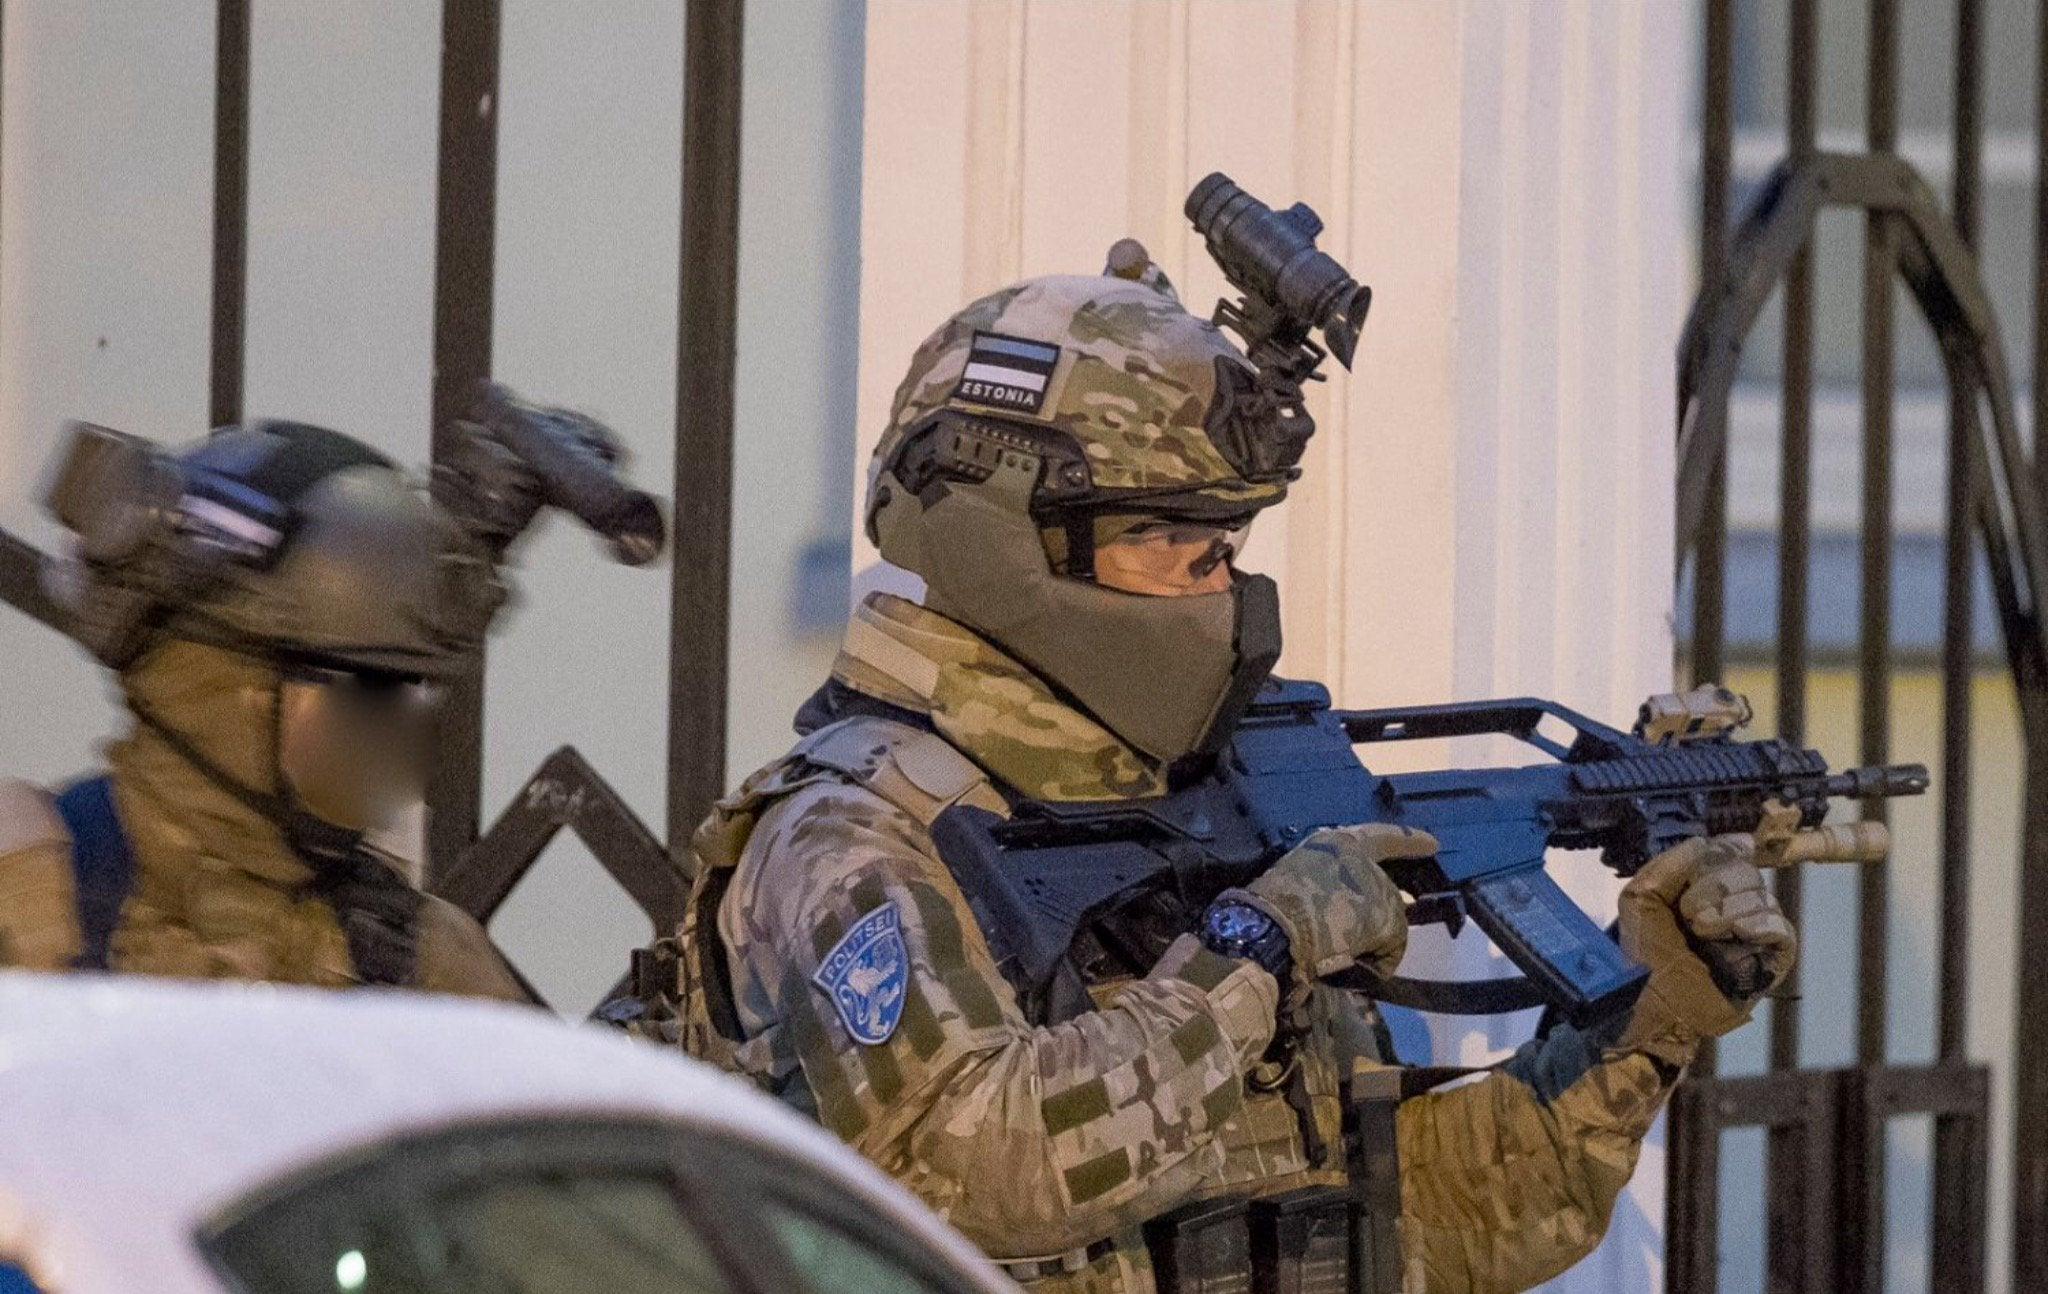 Estonian K-Commando operators during the tactical exercise ATHOS 2016